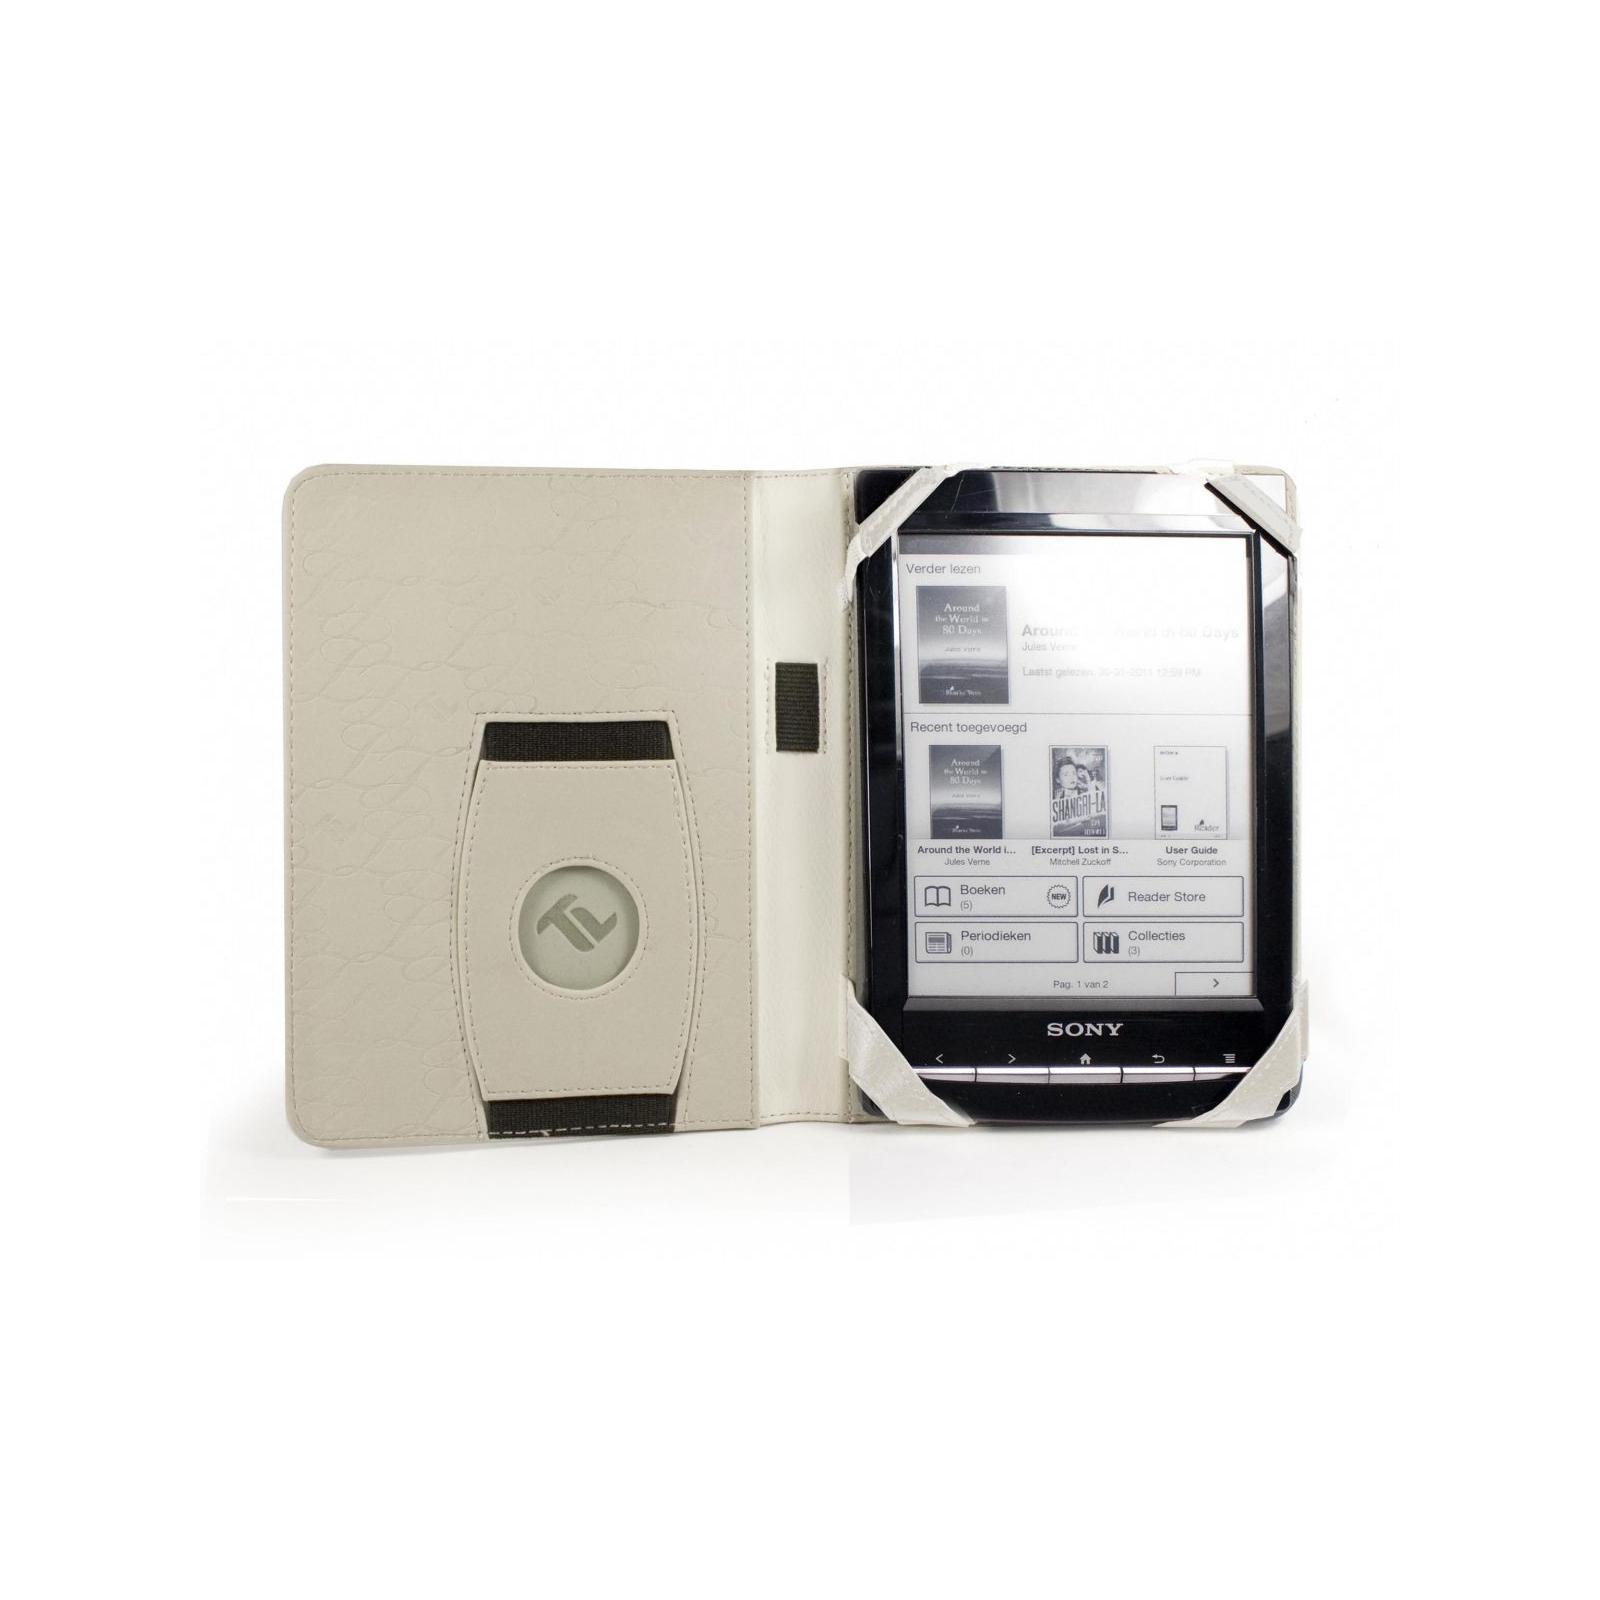 Чехол для электронной книги Tuff-Luv 6 Embrace faux leather/Arctic White (C4_56) изображение 2